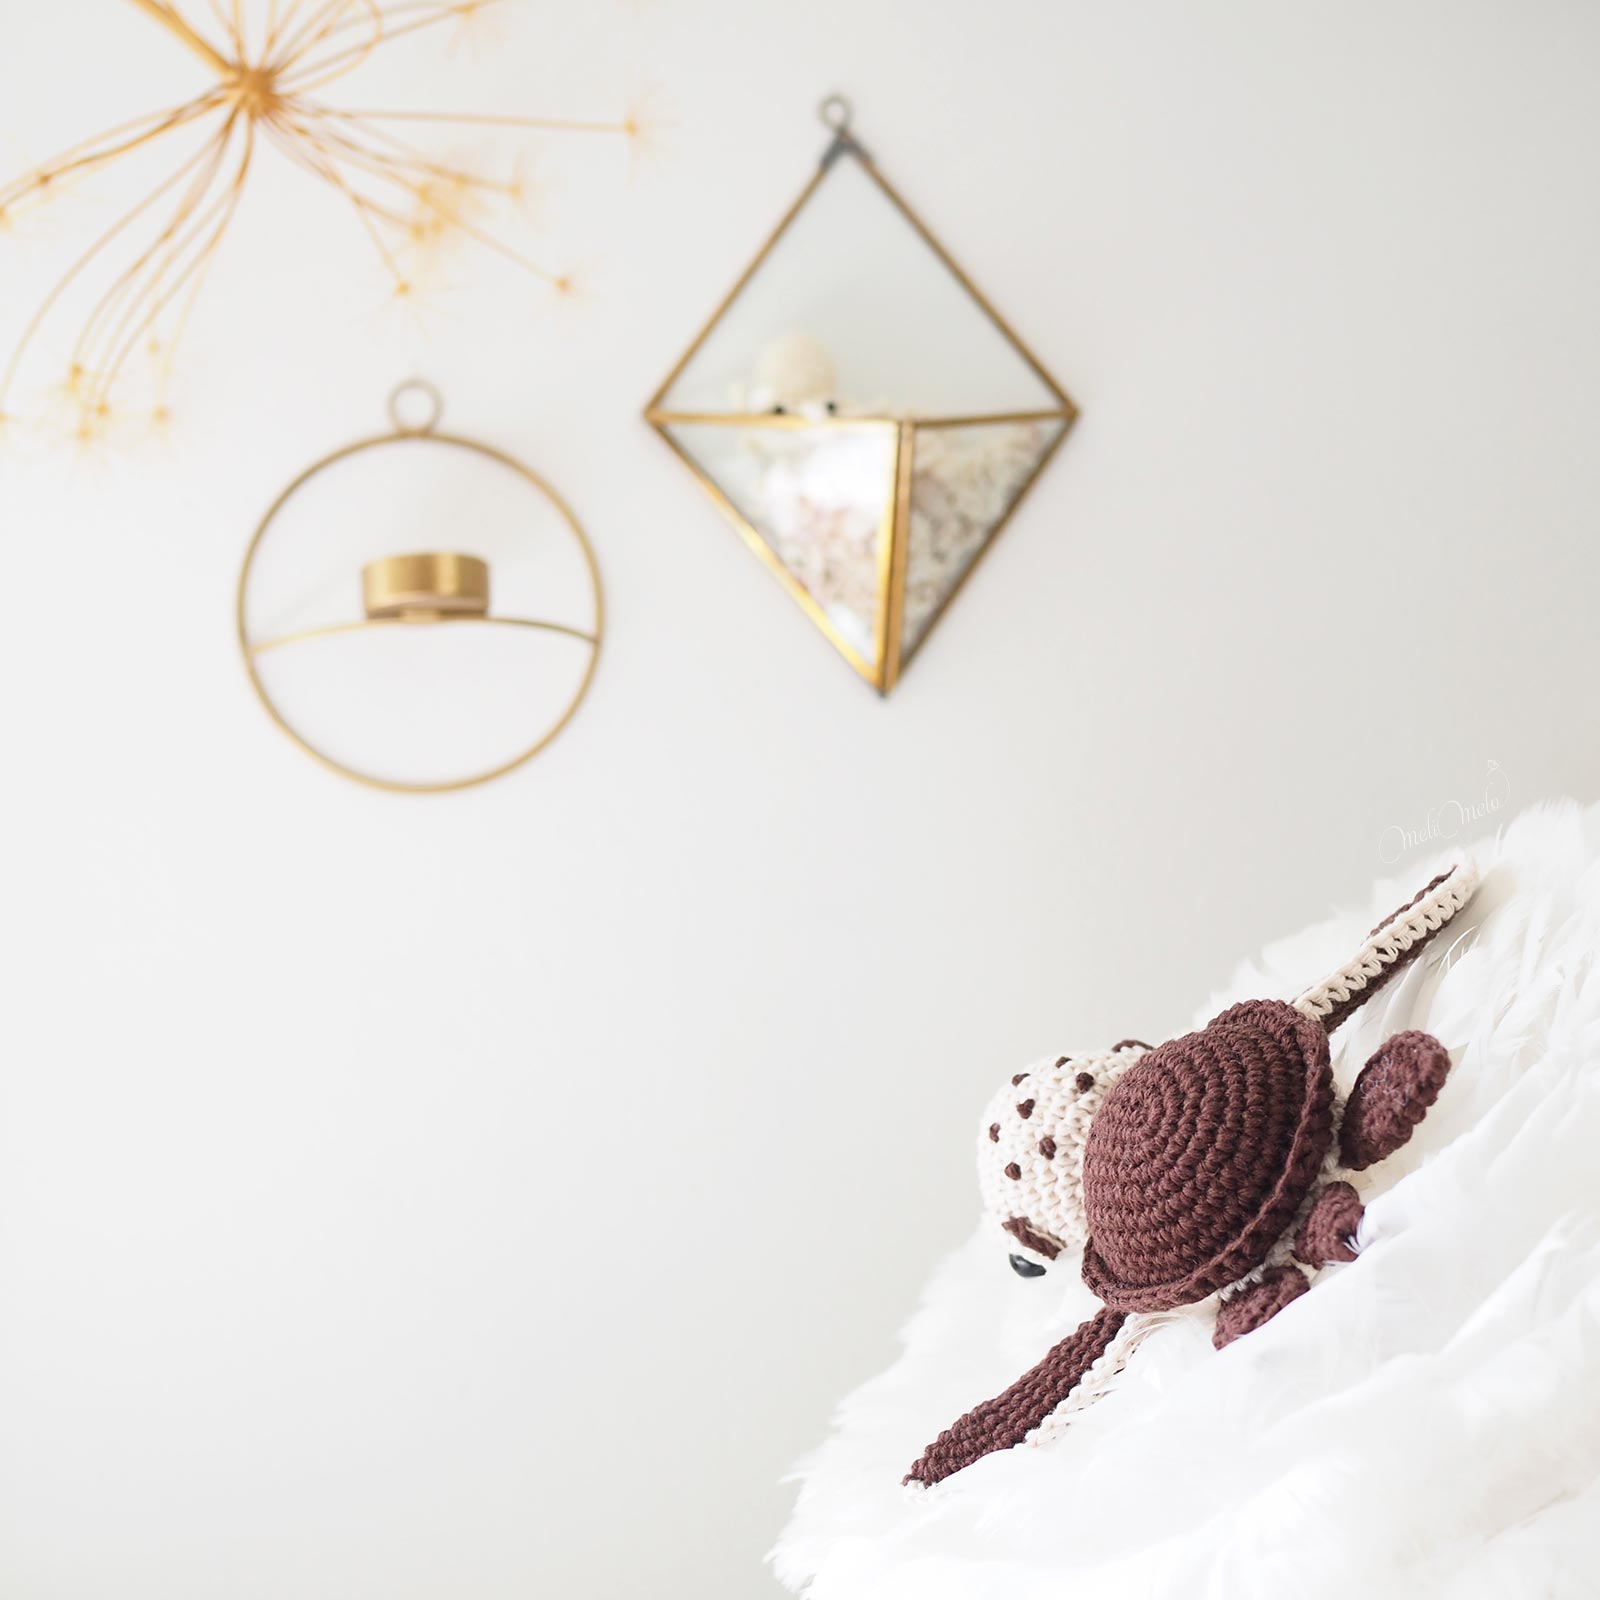 crochet-tortue-amigurumiwildlife-ricorumi-chocolate-cotton-laboutiquedemelimelo